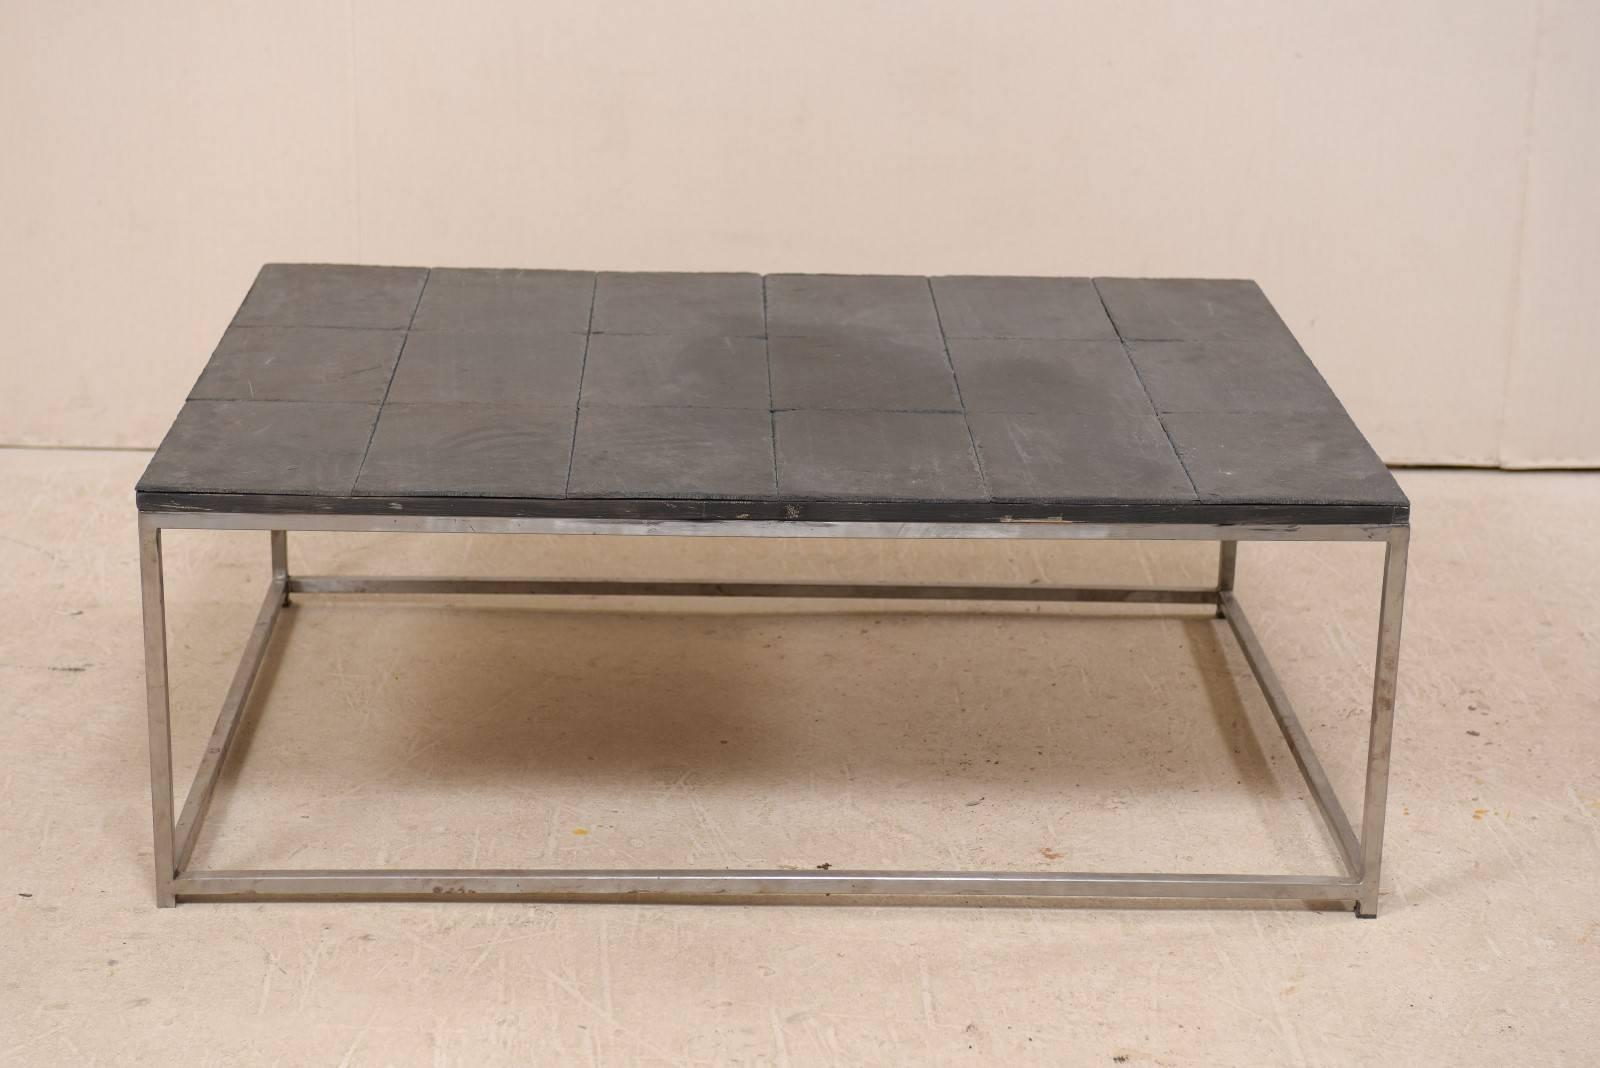 modern style coffee table with slate tiled top and stylish custom metal base